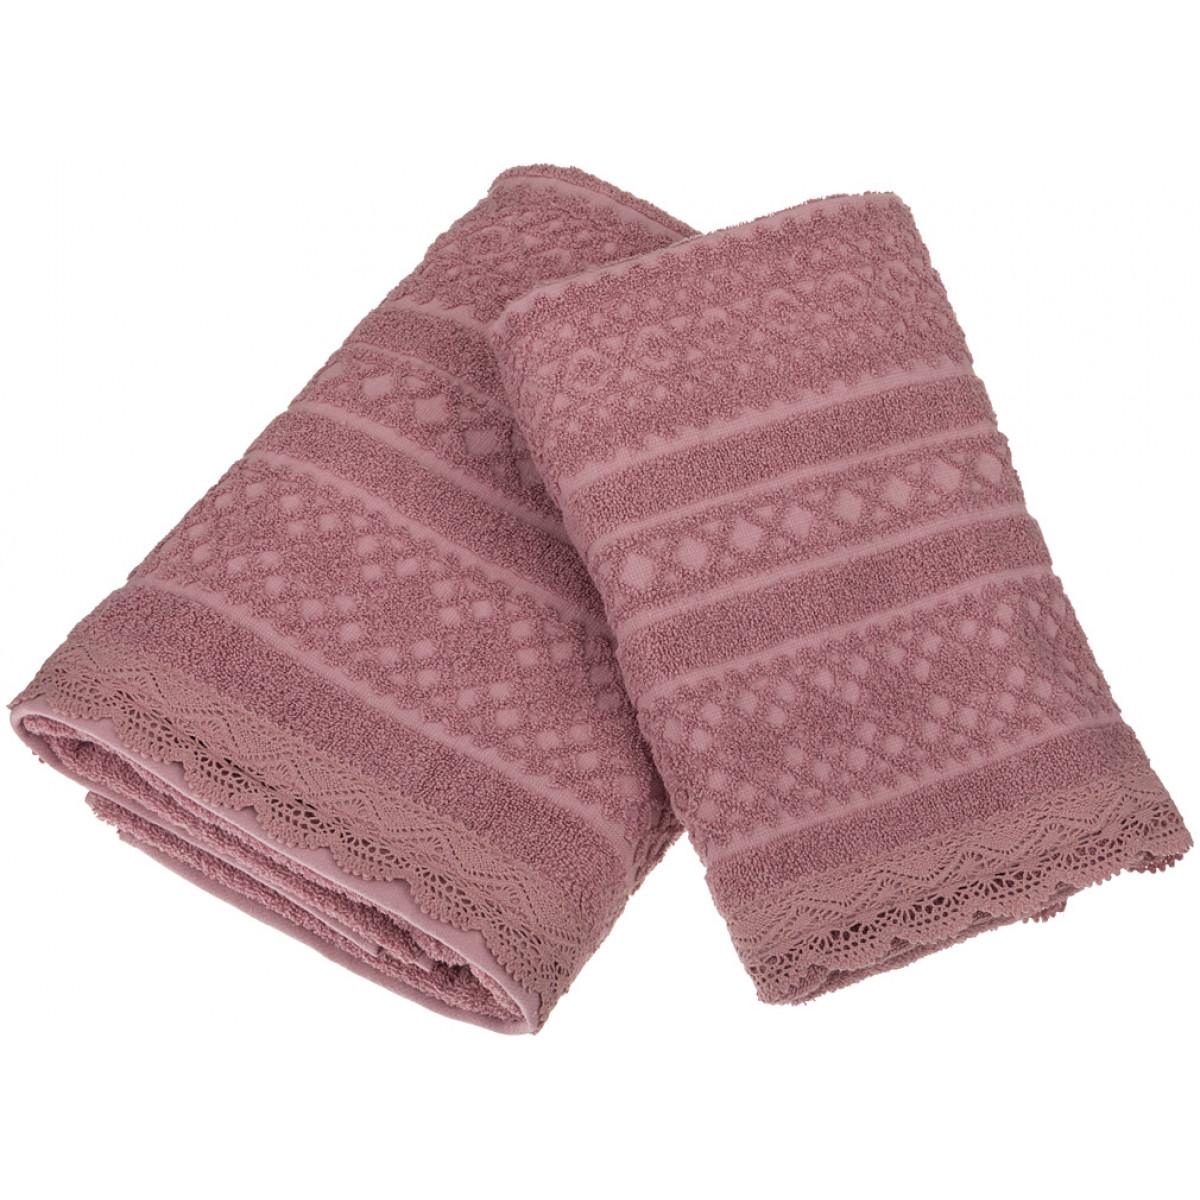 Полотенца Santalino Полотенце Nicky  (50х90 см,70х140 см) полотенца santalino полотенце shulamite 40х70 см